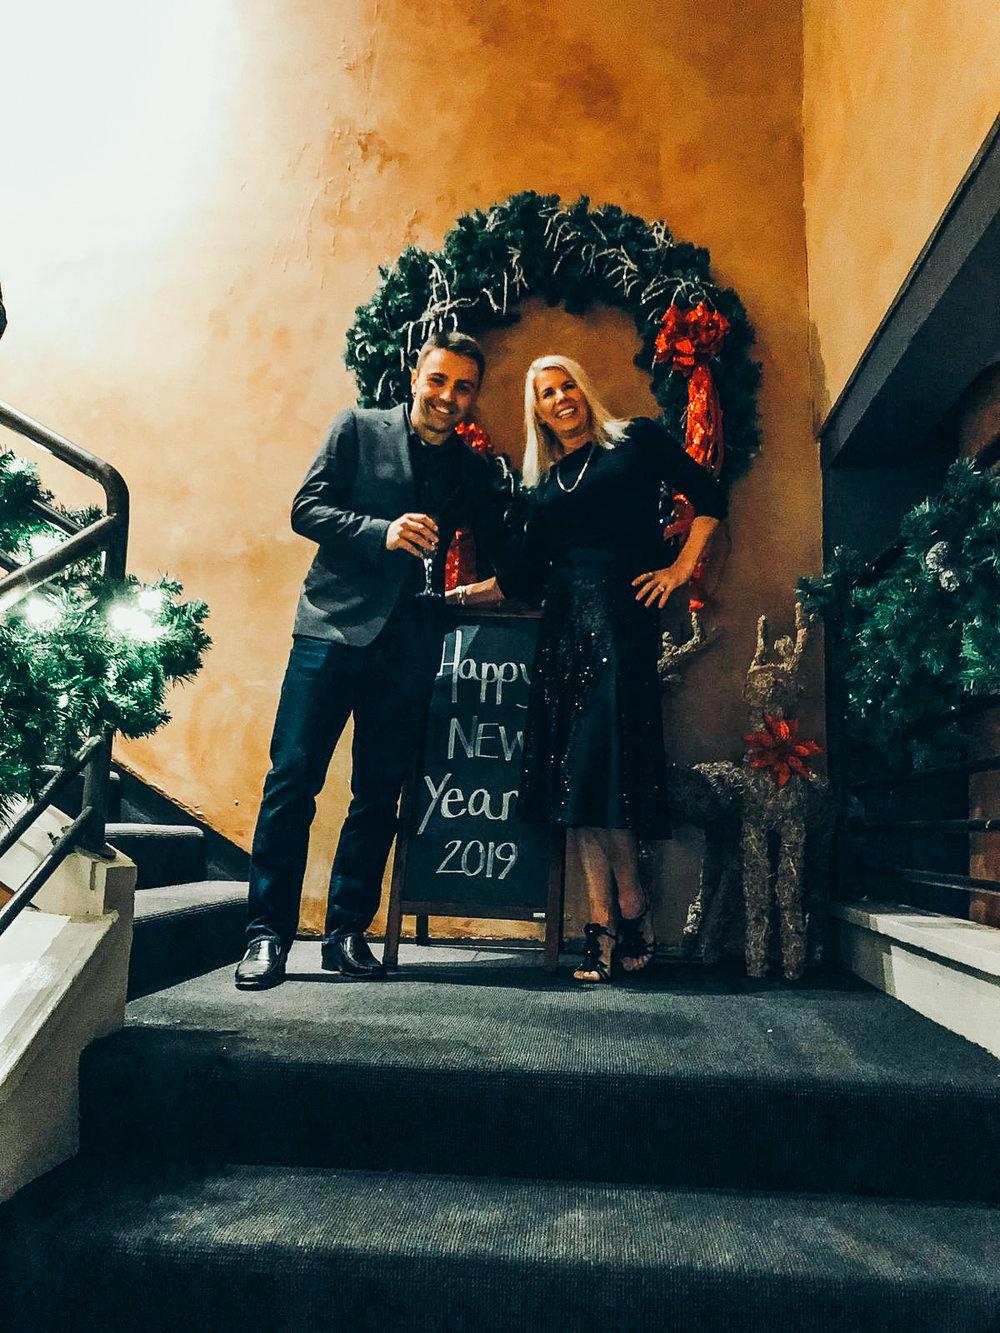 servino-tiburon-christmas-new years eve-local-festive-family-time-6.jpg